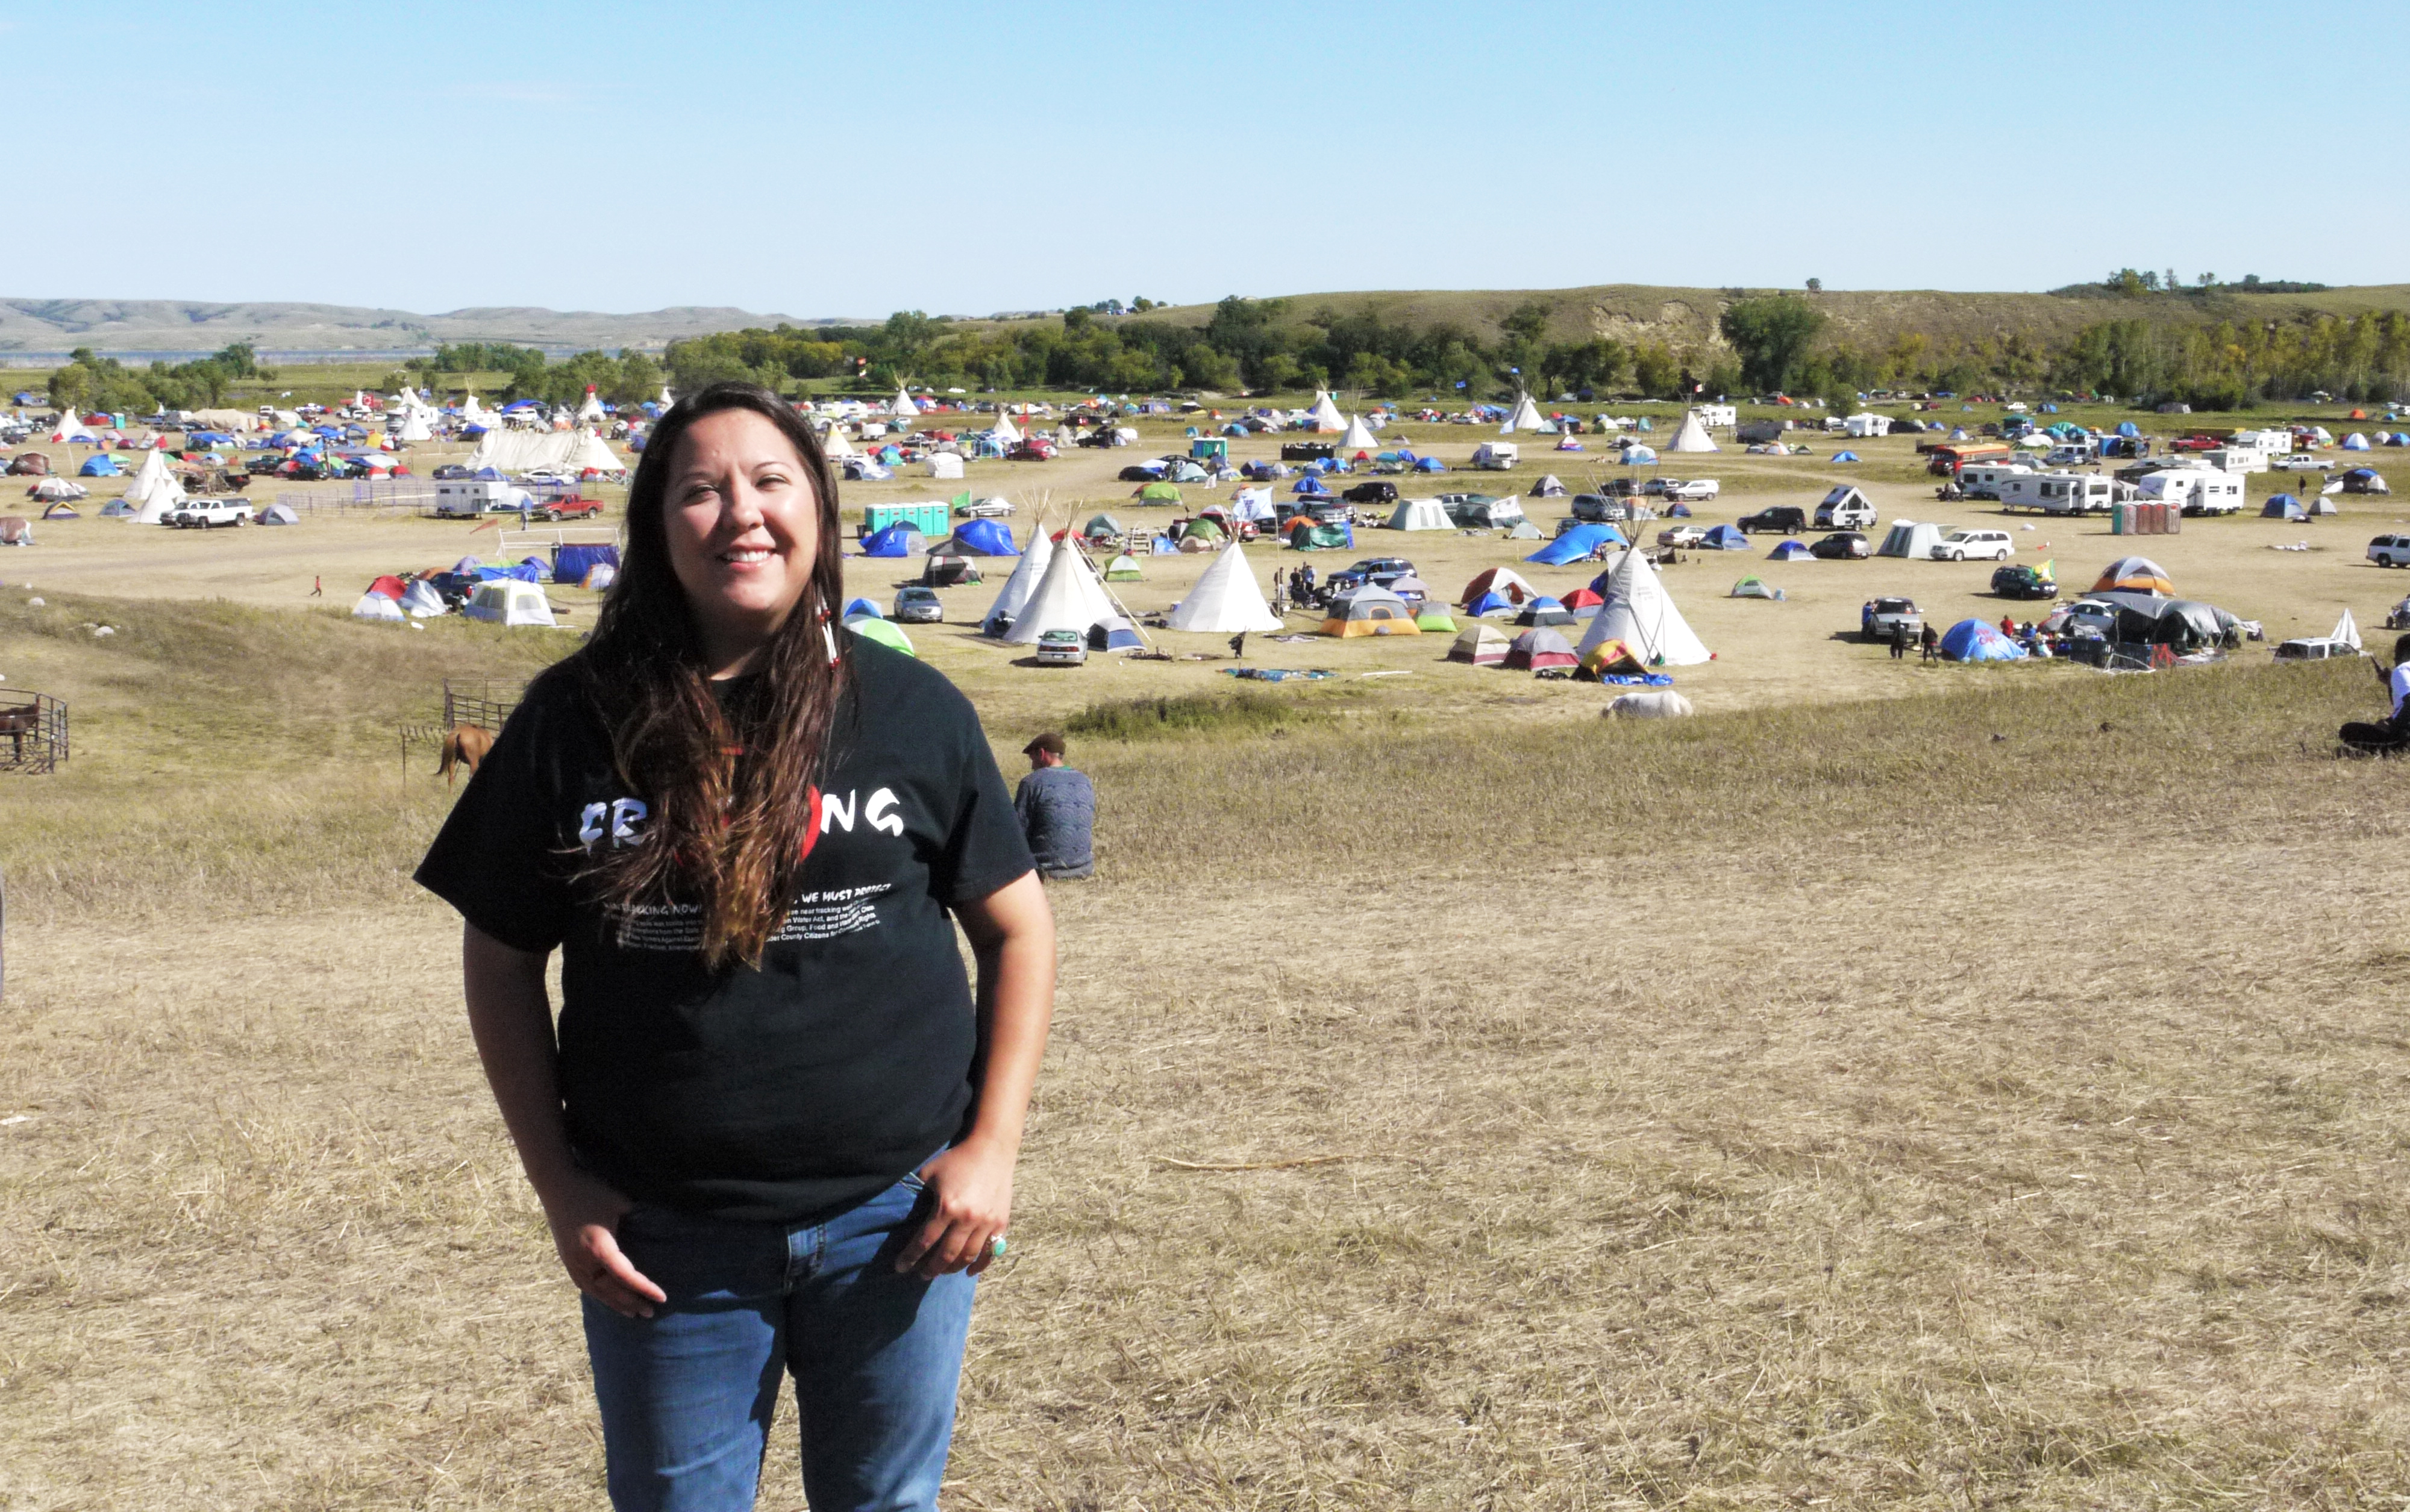 Kandi Mossett  on a hill overlooking the Oceti Sakowin camp. (Sarah Jaffe for BillMoyers.com)